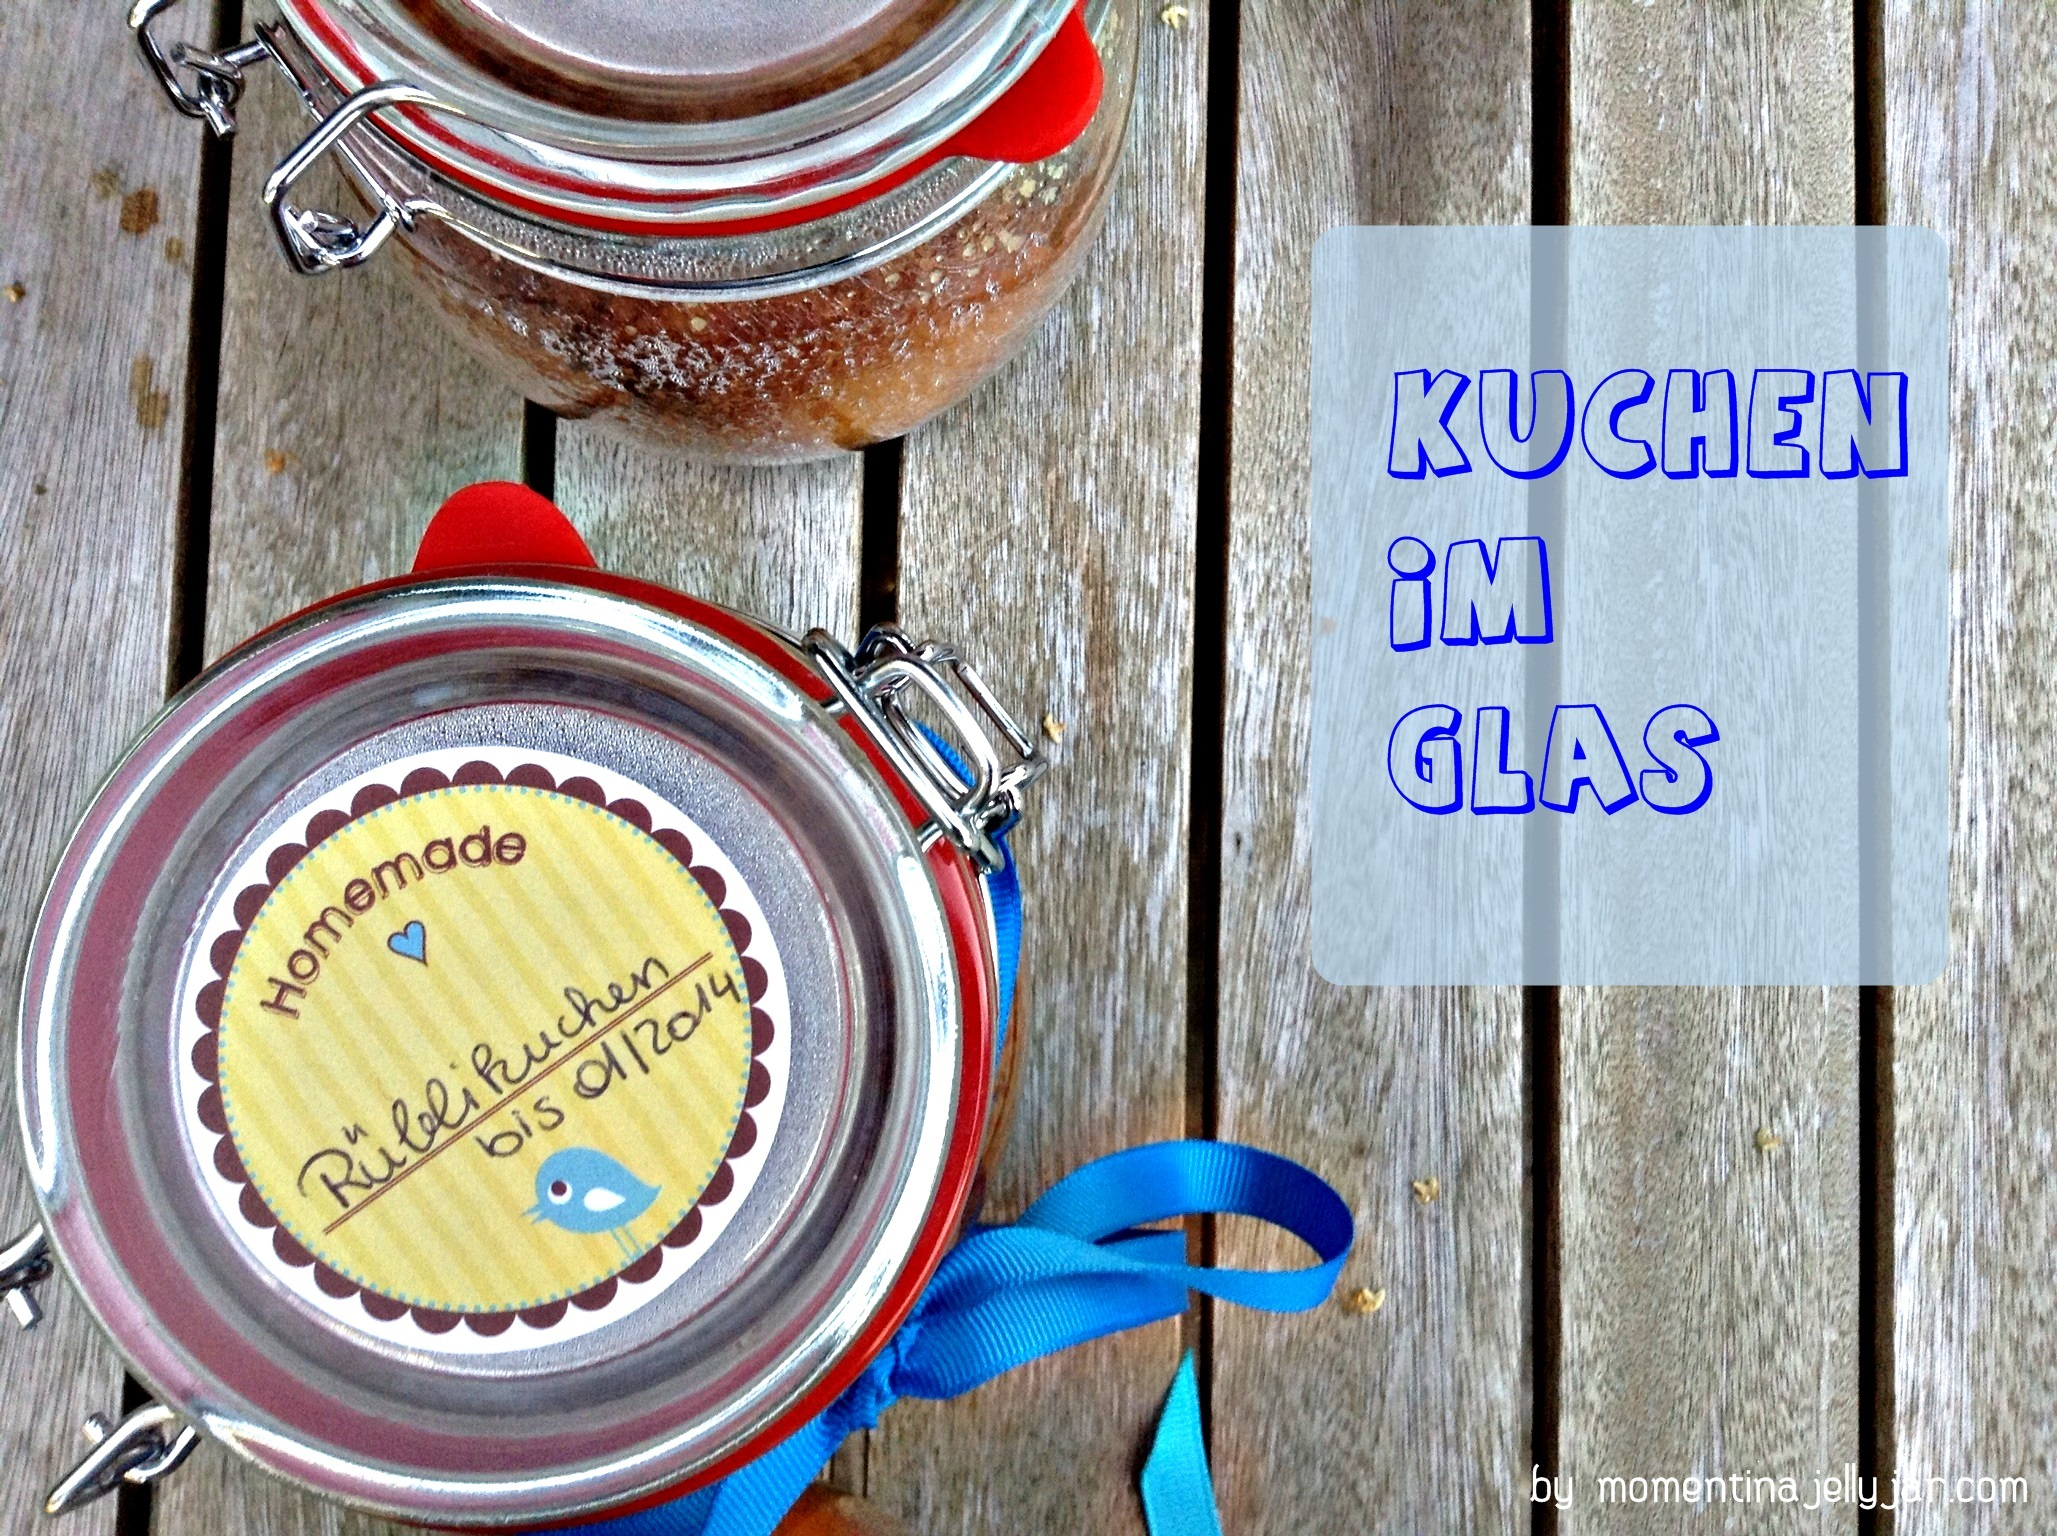 Kuchen Im Glas by momentinajellyjar.com